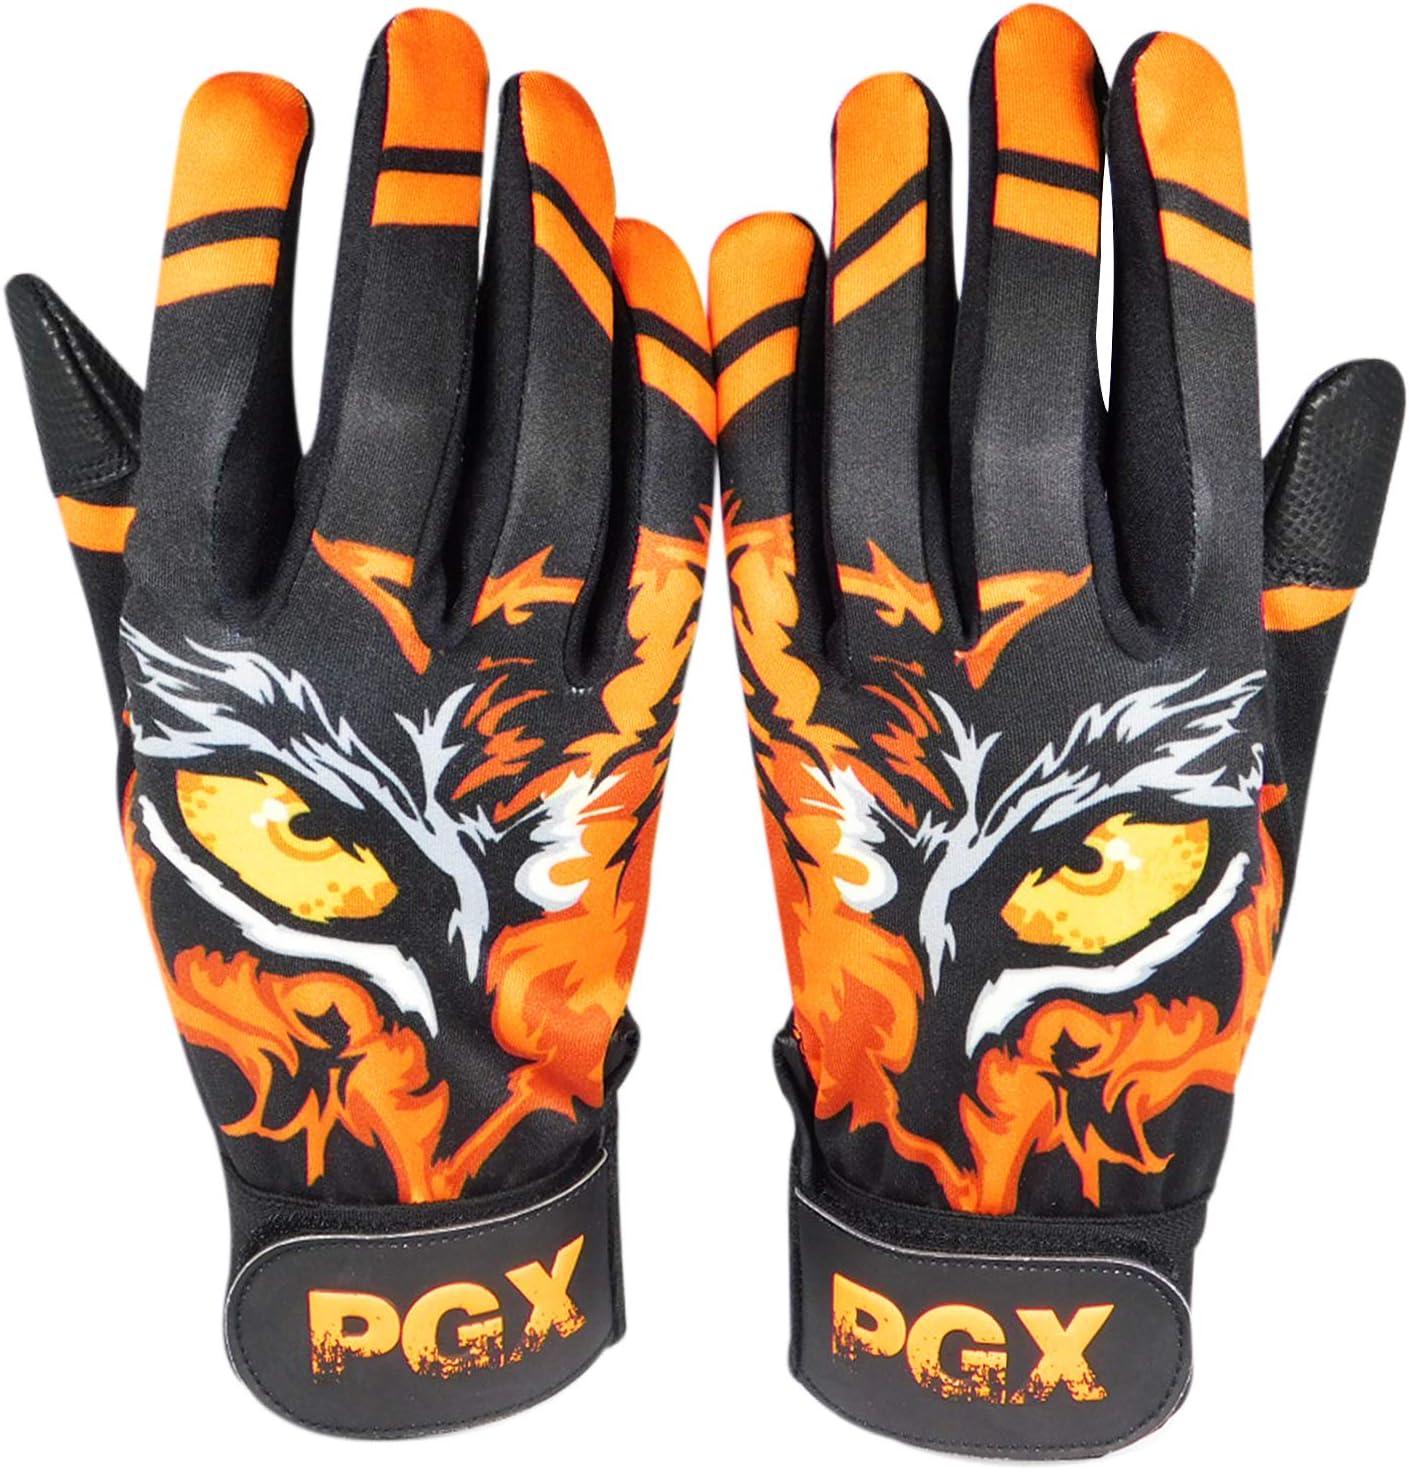 Youth PGX Eye of The Tiger Baseball Batting Gloves